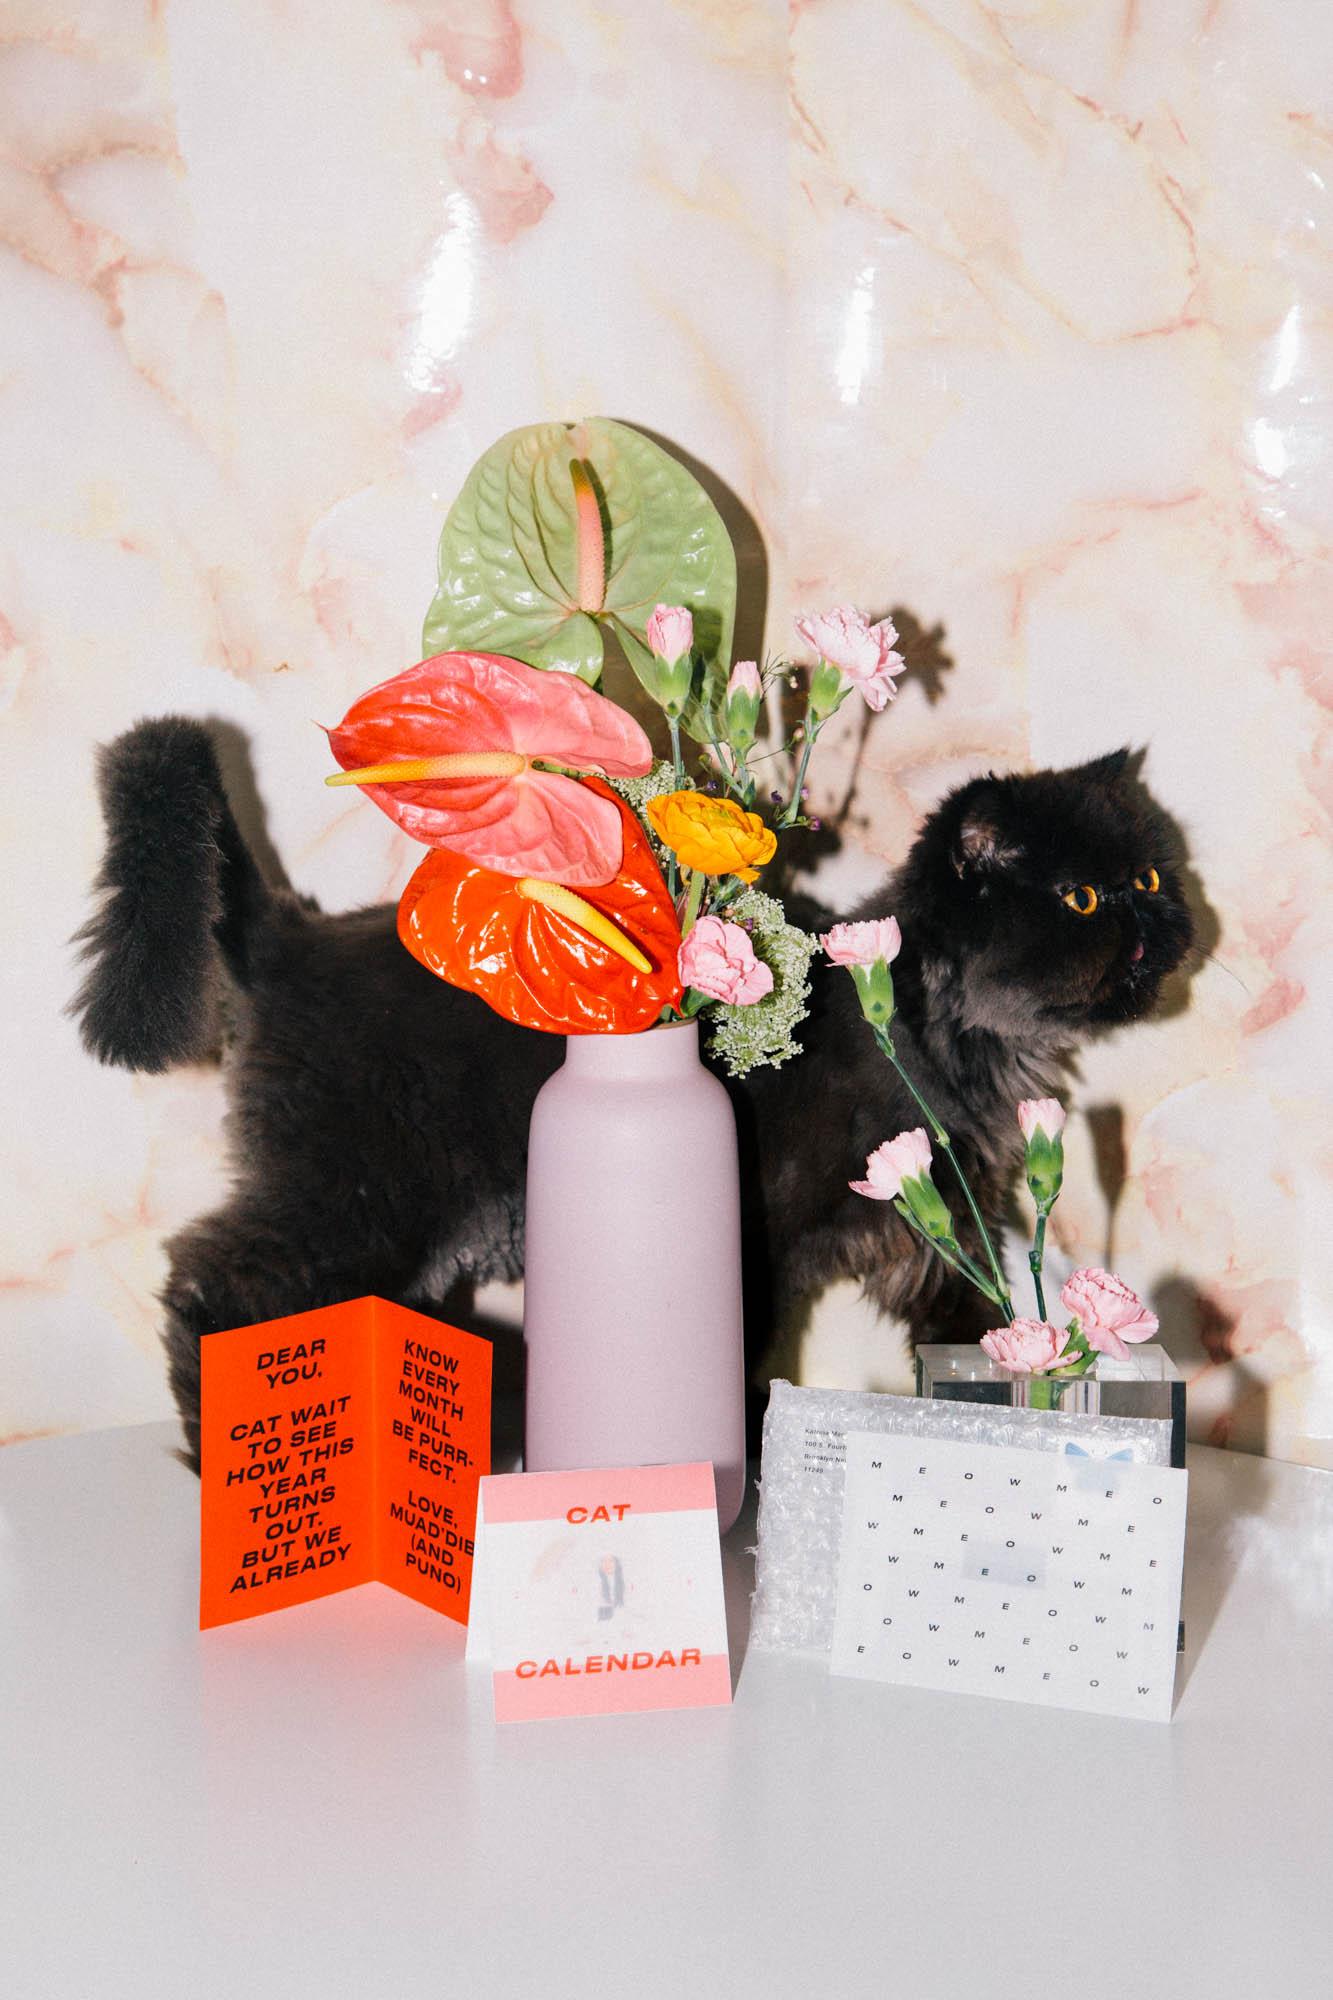 IMG_6796-cat-calendar-puno-goodsgang-krizia-2018-3.jpg